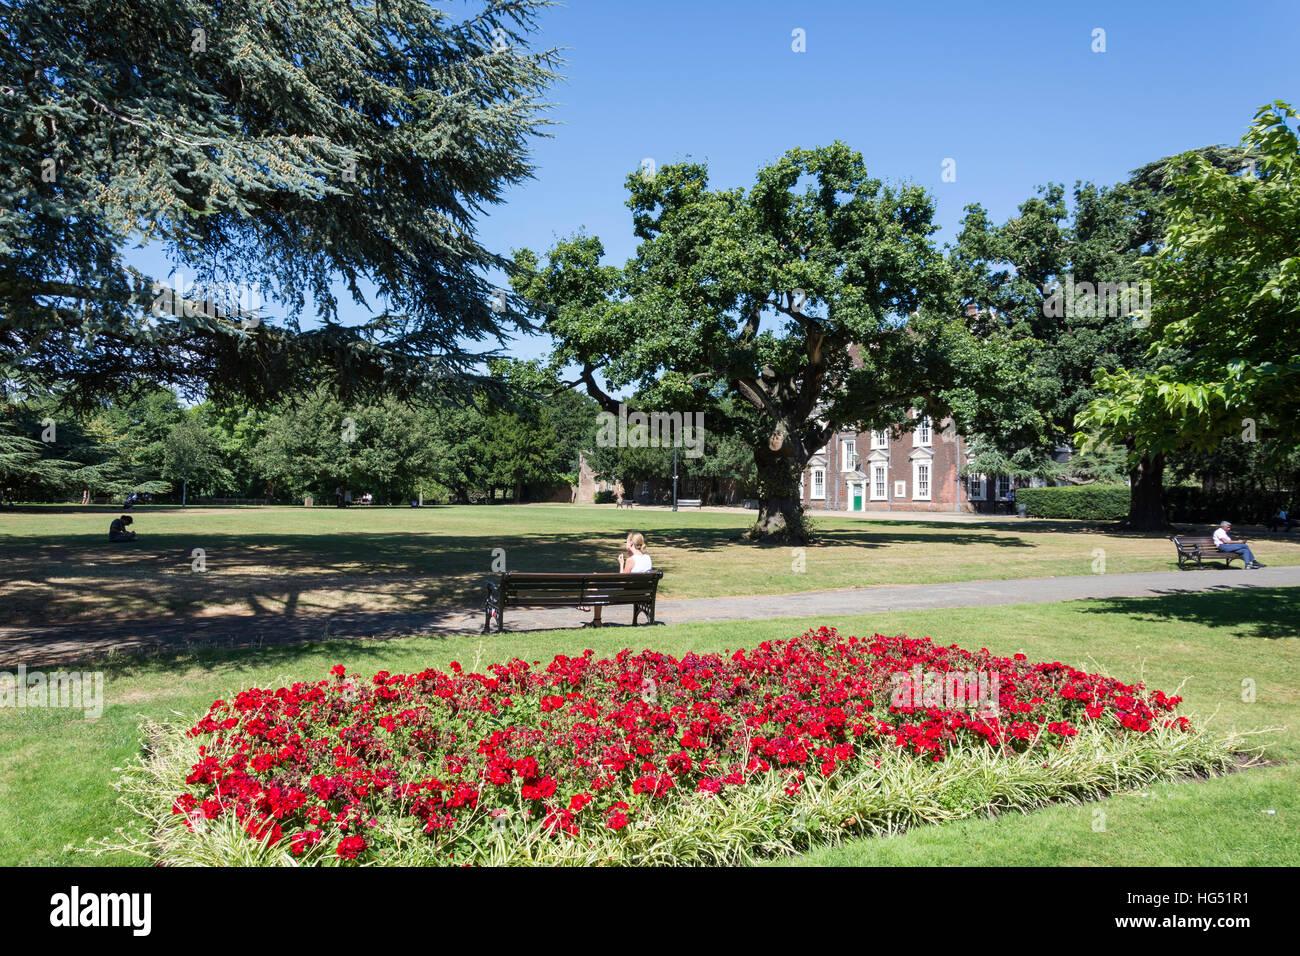 Boston Manor Park, Brentford, Hounslow, London Borough of Greater London, England, Reino Unido Imagen De Stock